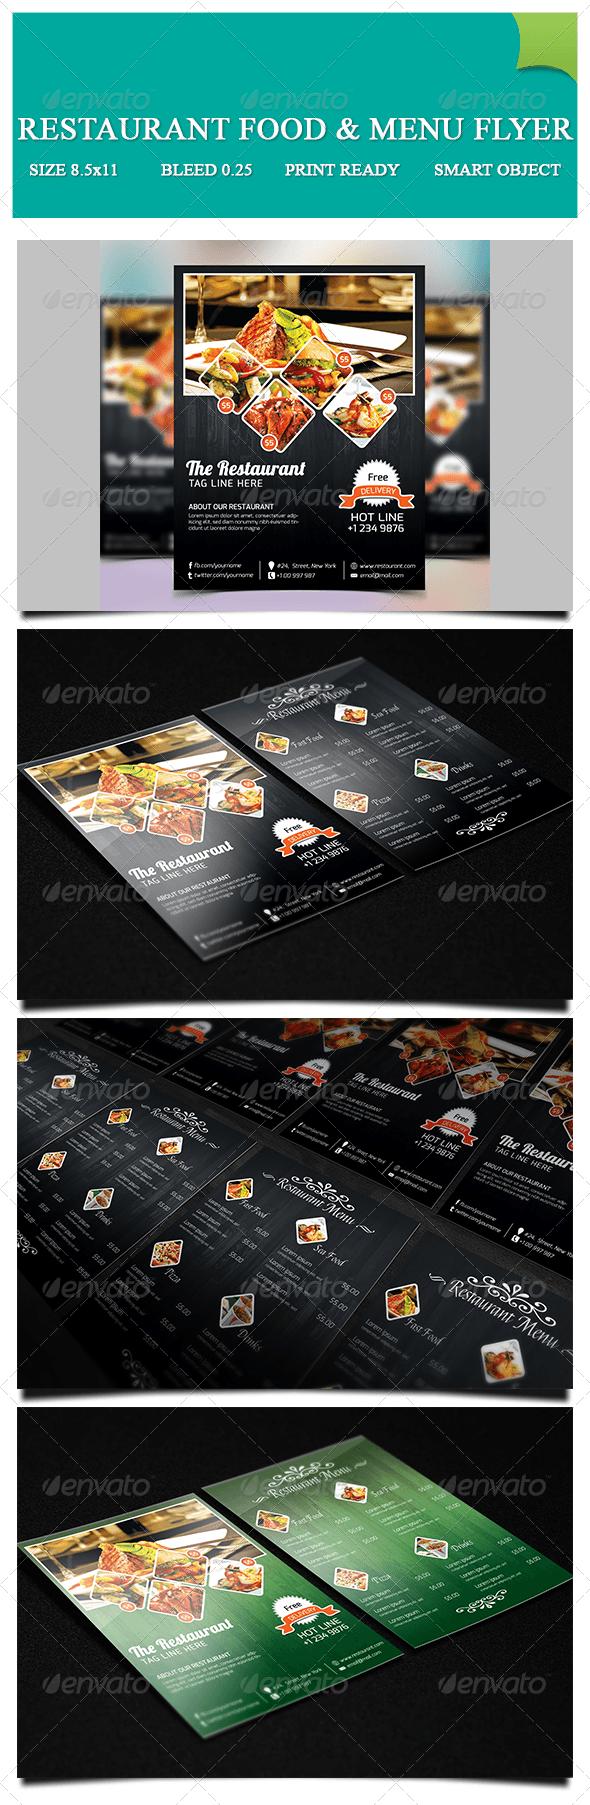 GraphicRiver Restaurant Food & Menu Flyer 7271353